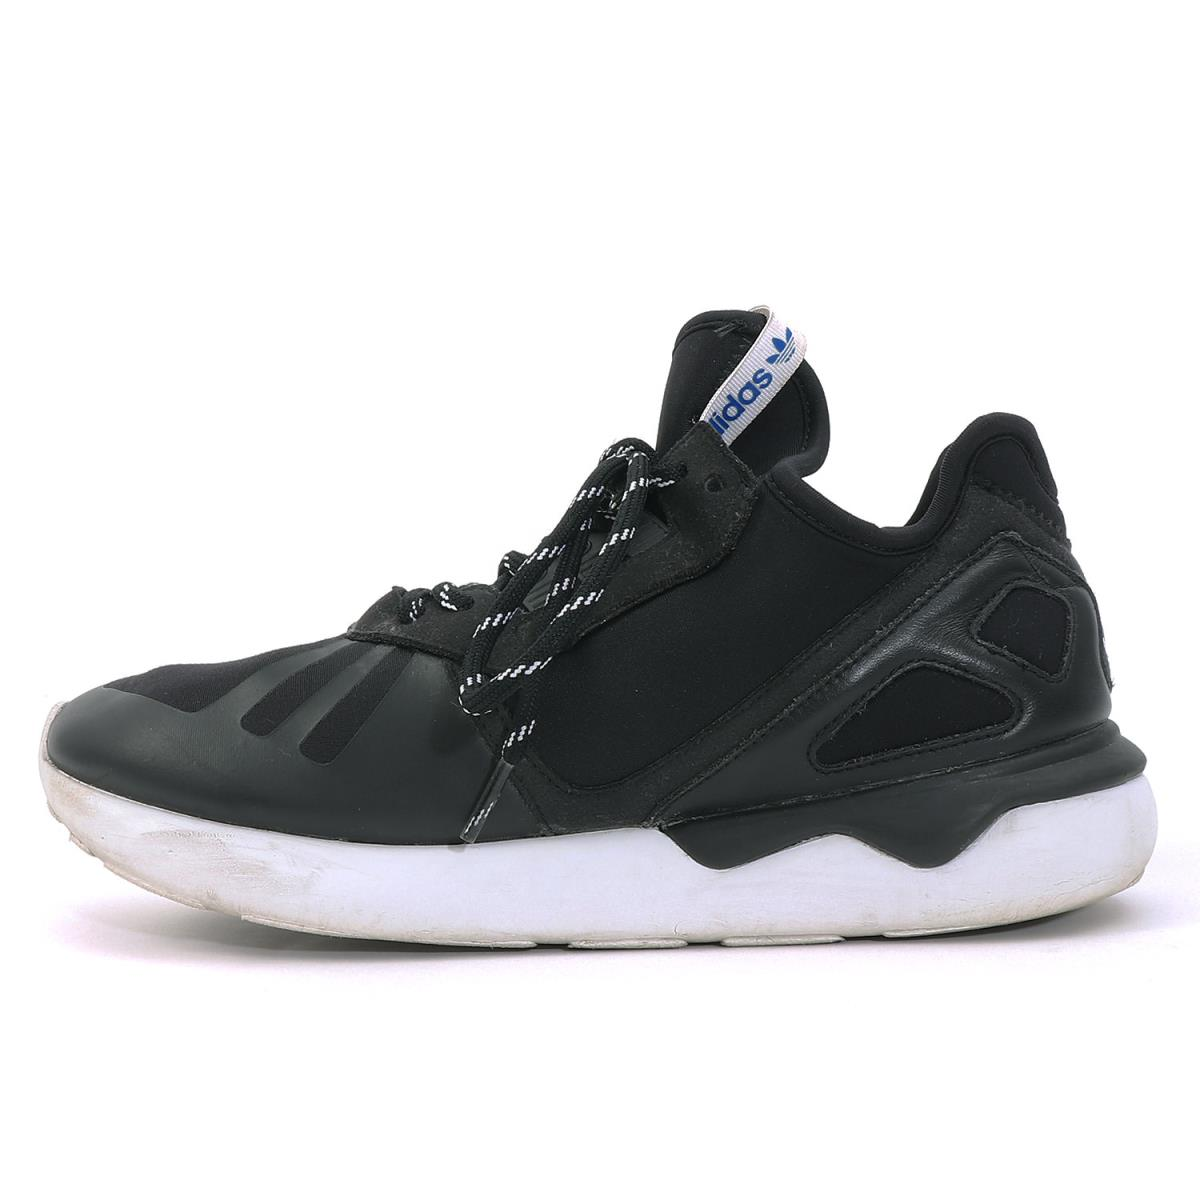 the best attitude 2c1ac 0acf0 adidas (Adidas) TUBULAR RUNNER (M19648) black US8.5(26.5cm)